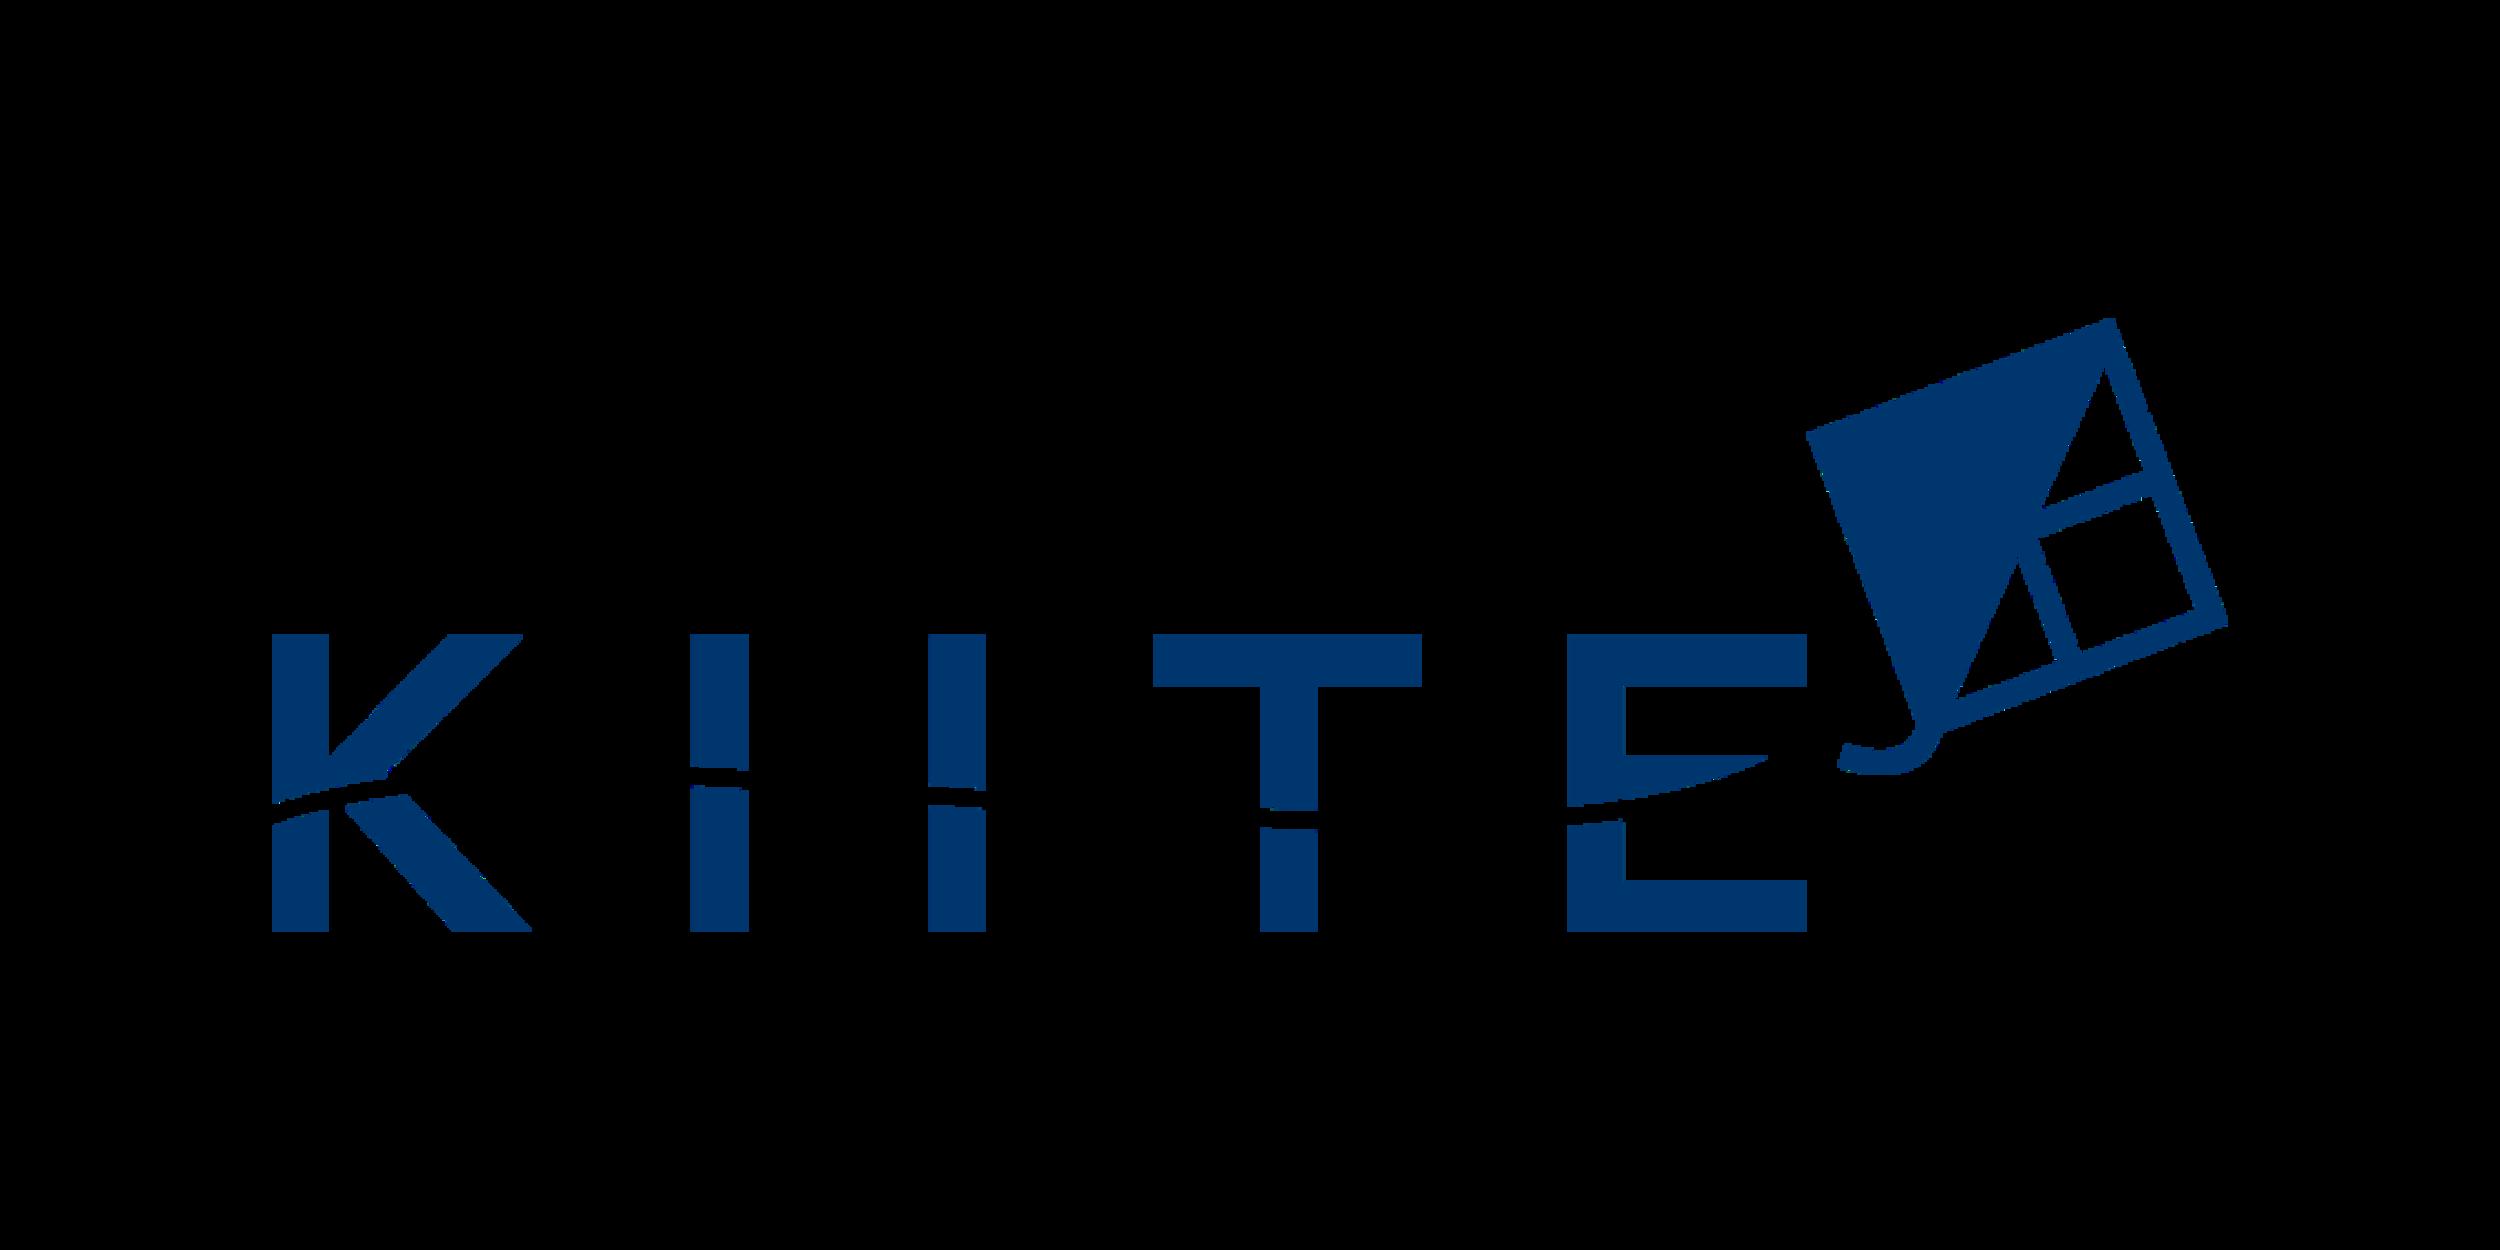 Kiite-logo-01.png